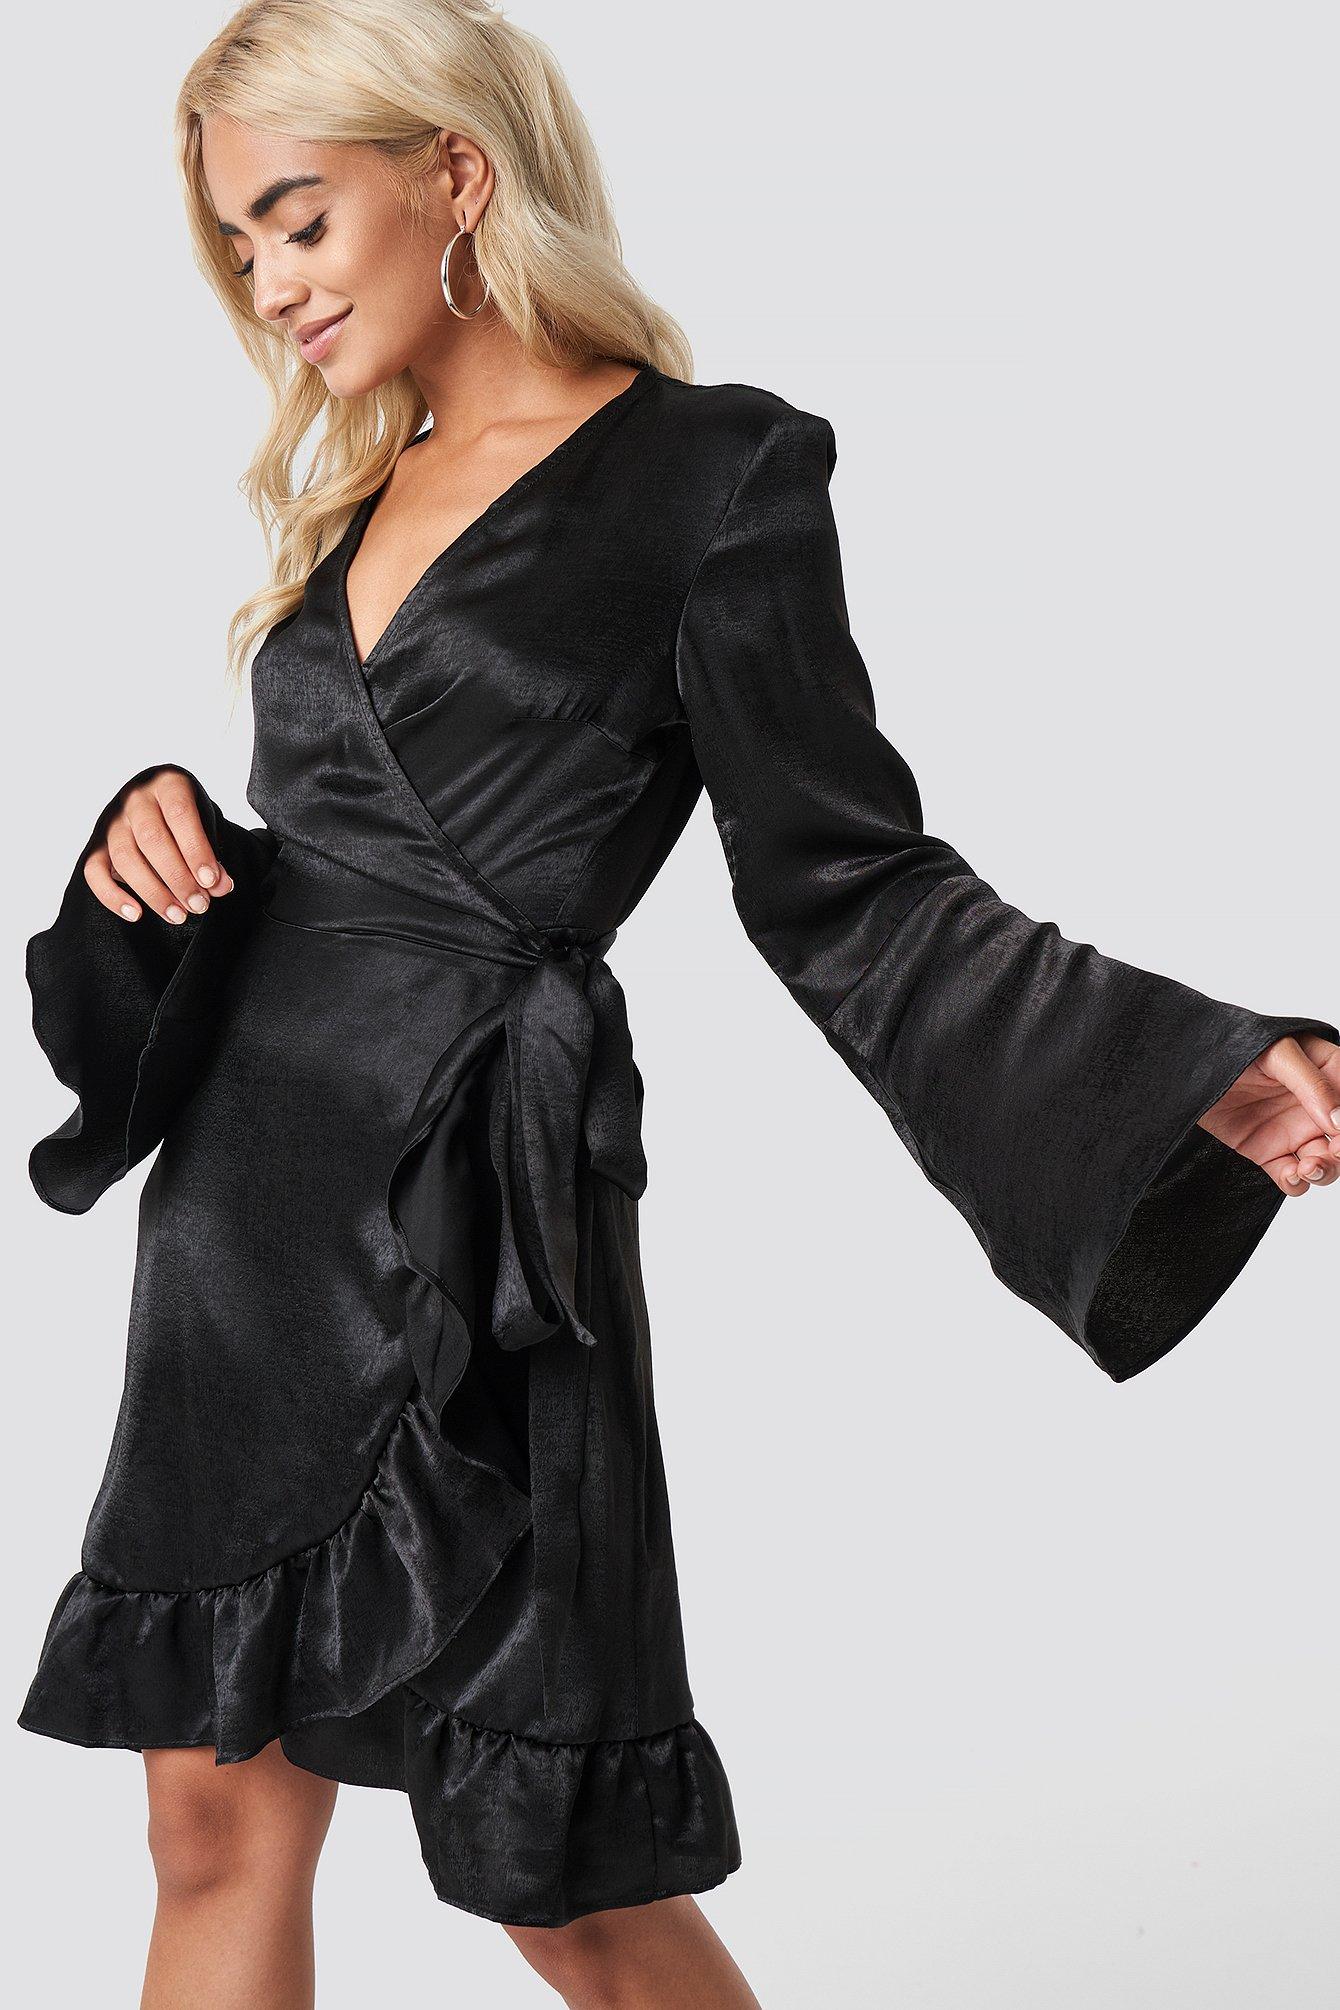 RUT & CIRCLE SOFIA WRAP FRILL DRESS - BLACK